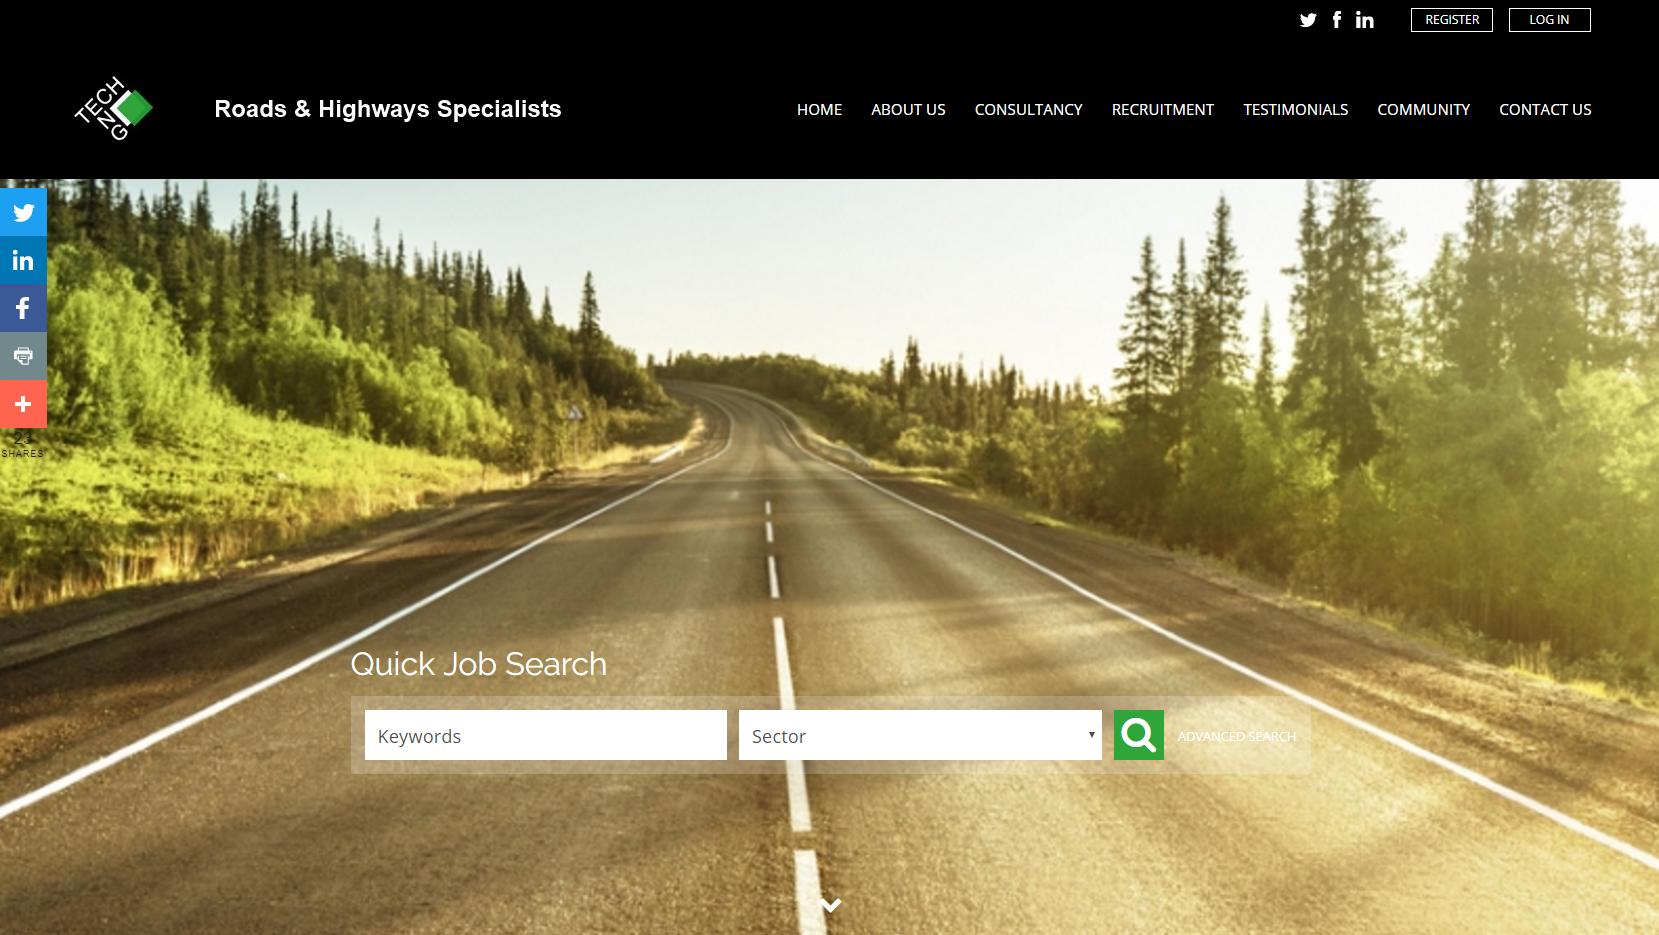 TechEng Ltd is a UK roads & highways specialist sector